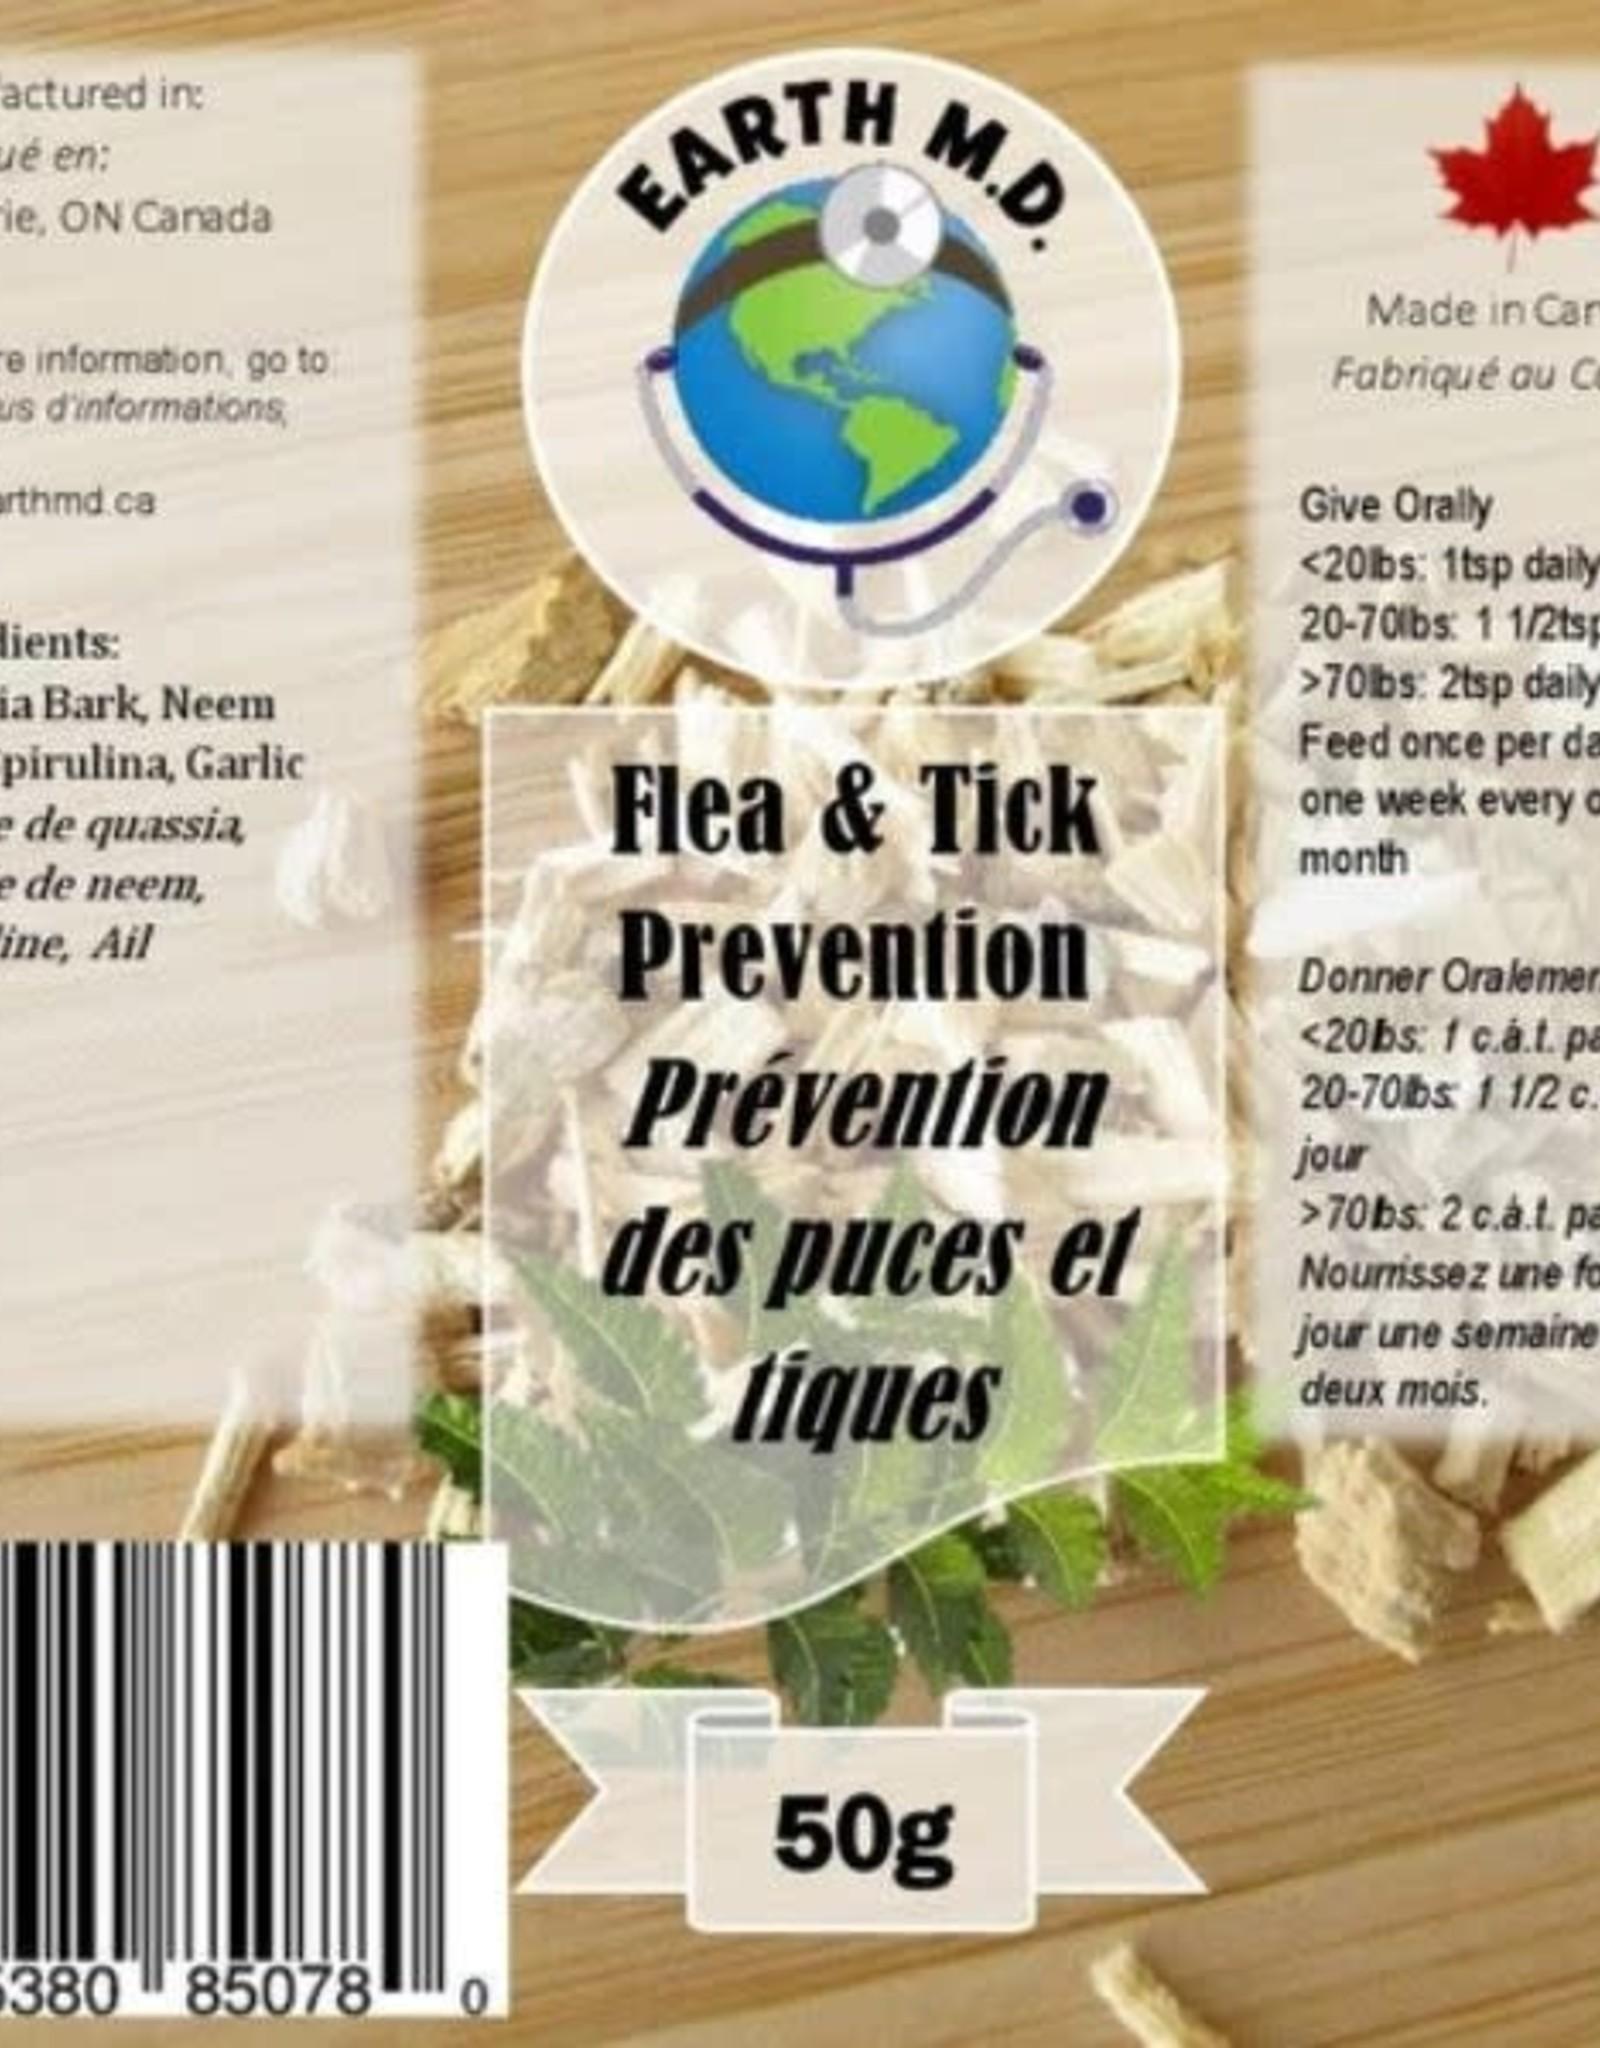 Earth MD earth md flea & tick